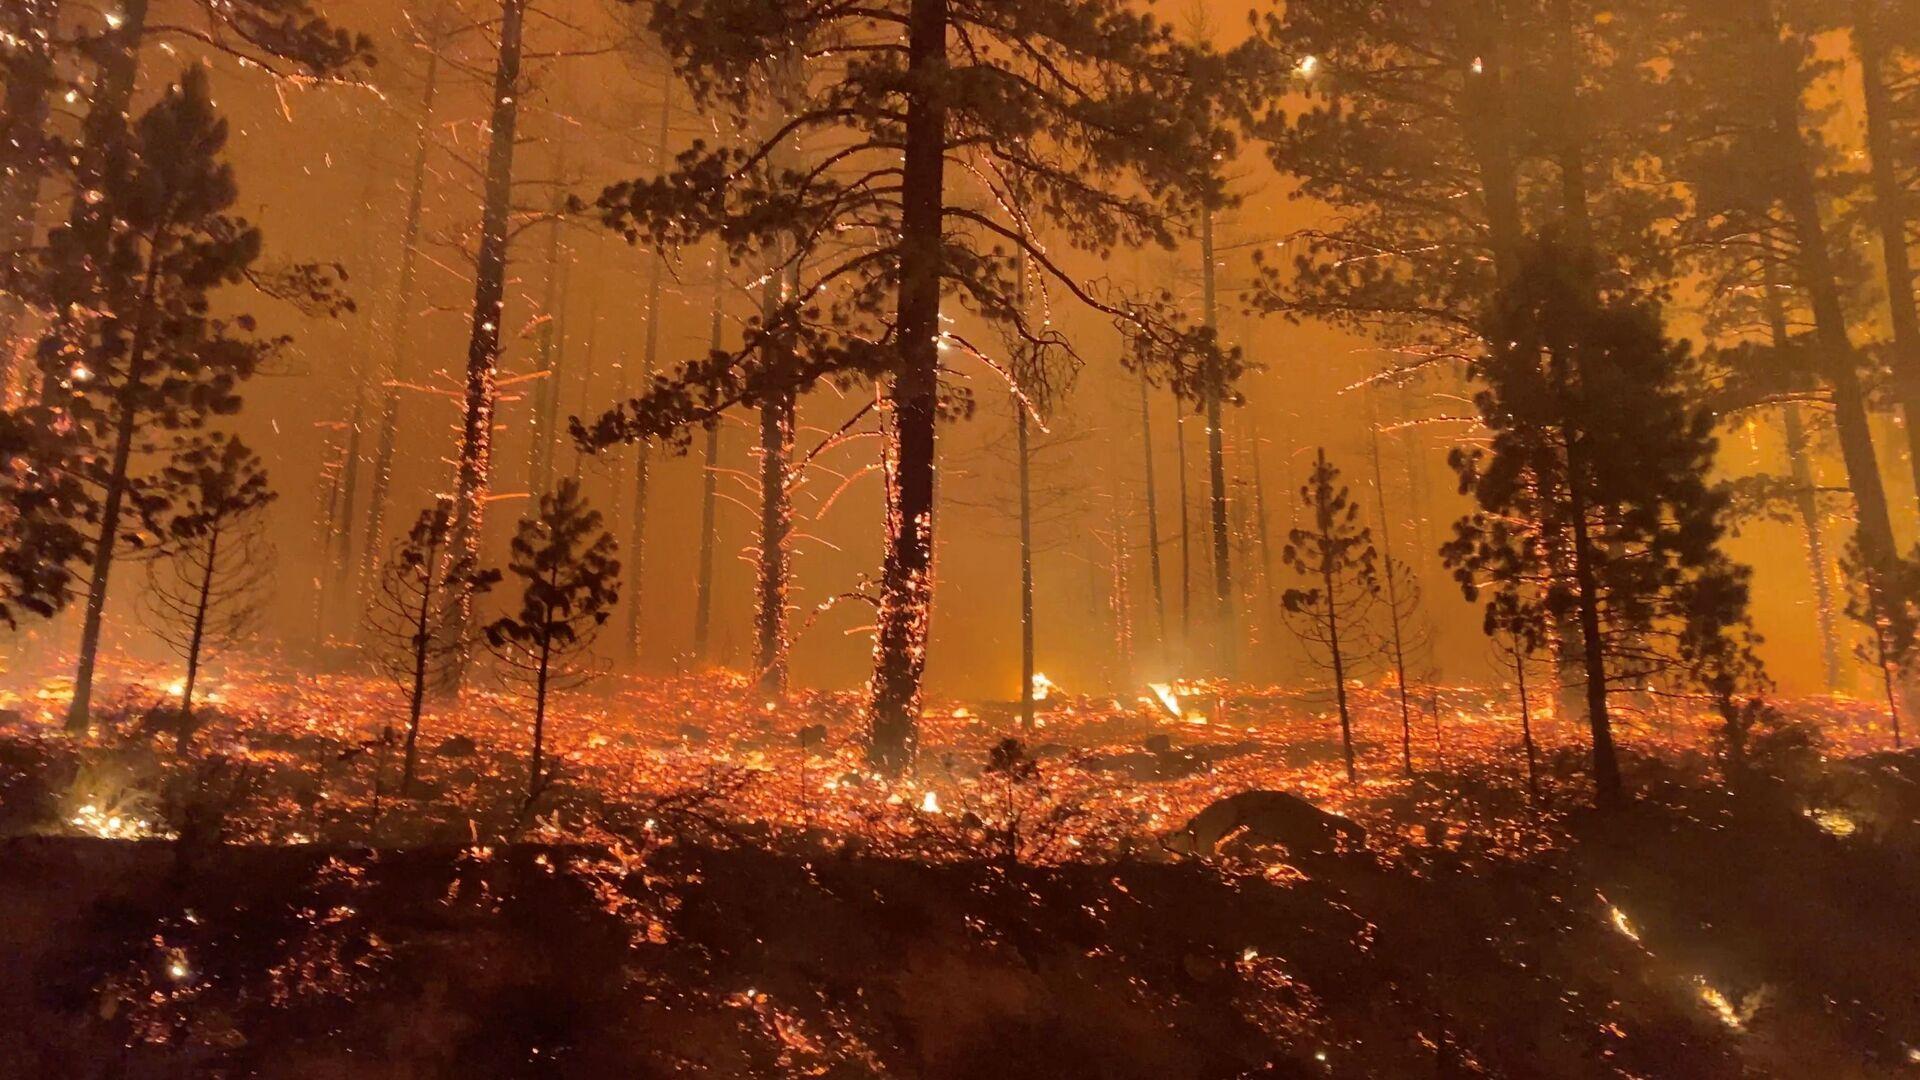 Горящий лес в Калифорнии, США - Sputnik Česká republika, 1920, 09.08.2021